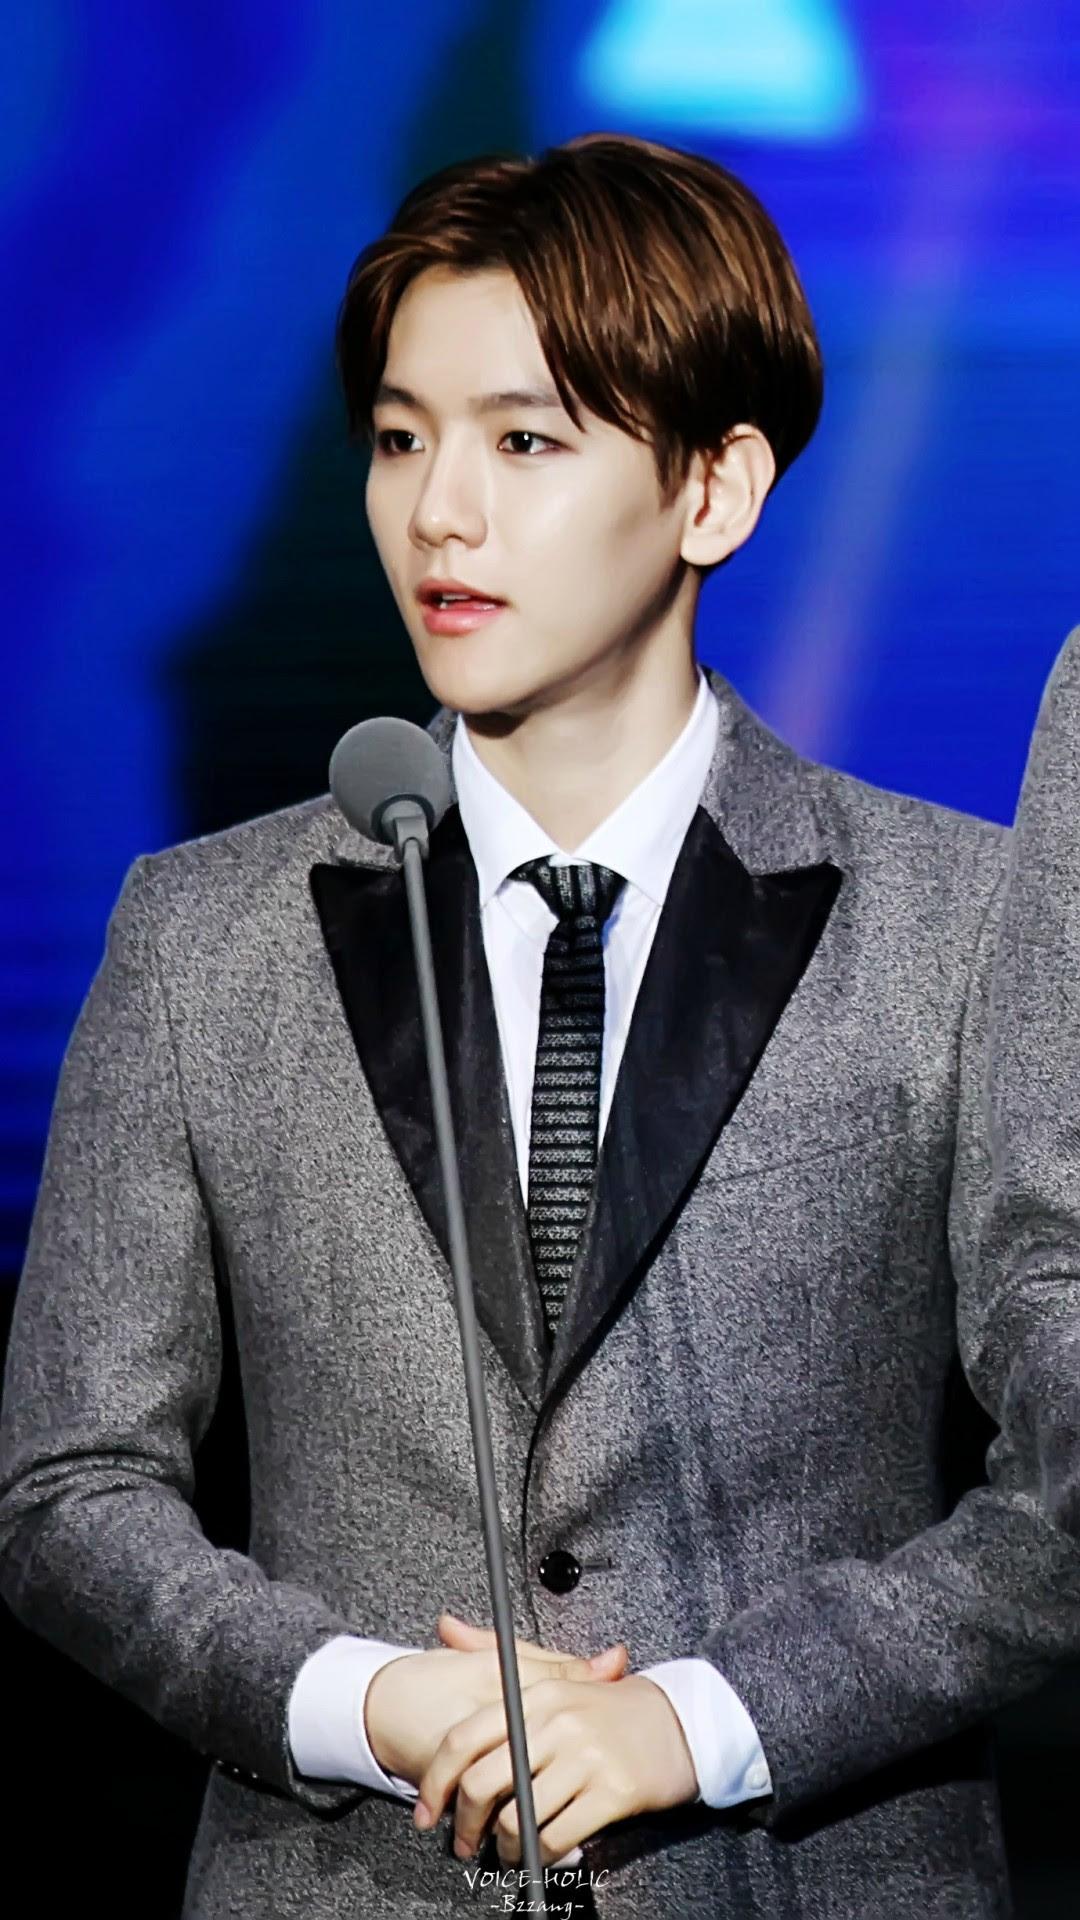 150116 Youku Night © bzzang| do not edit.